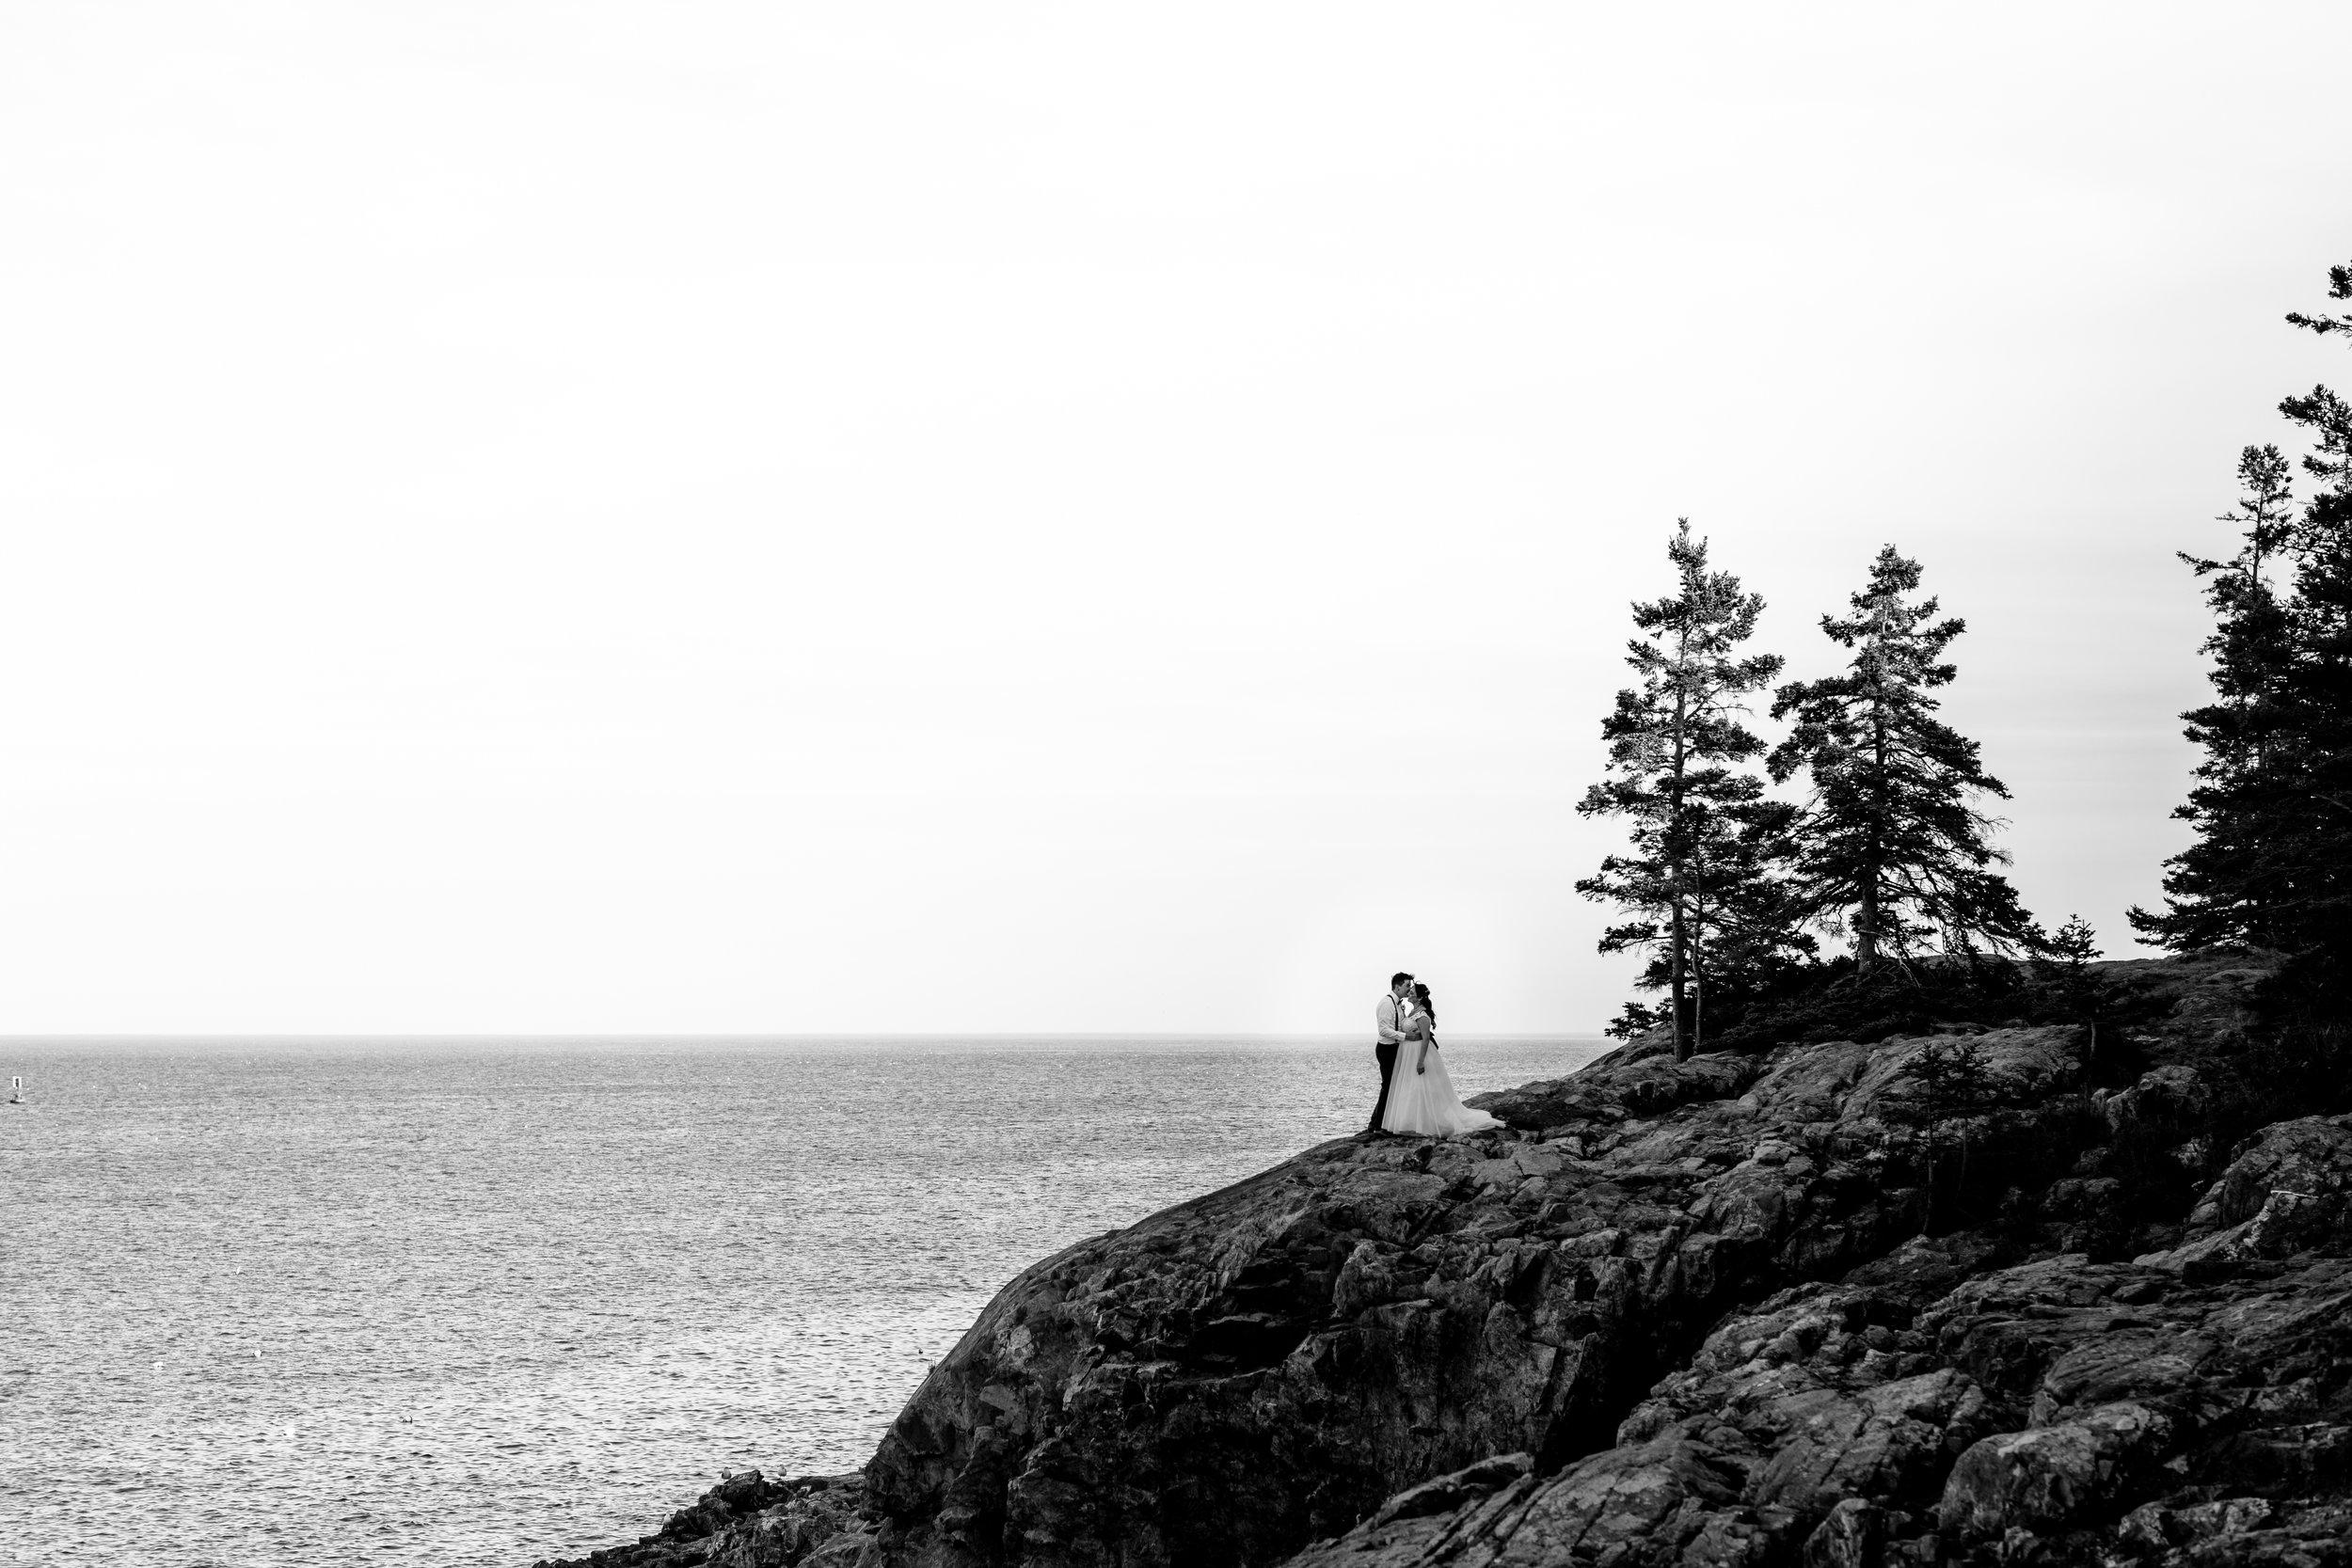 nicole-daacke-photography-Elopement-rocky-shoreline-coast-Acadia-National-Park-elopement-photographer-inspiration-maine-elopement-otter-cliffs-schoonic-head-point-42.jpg